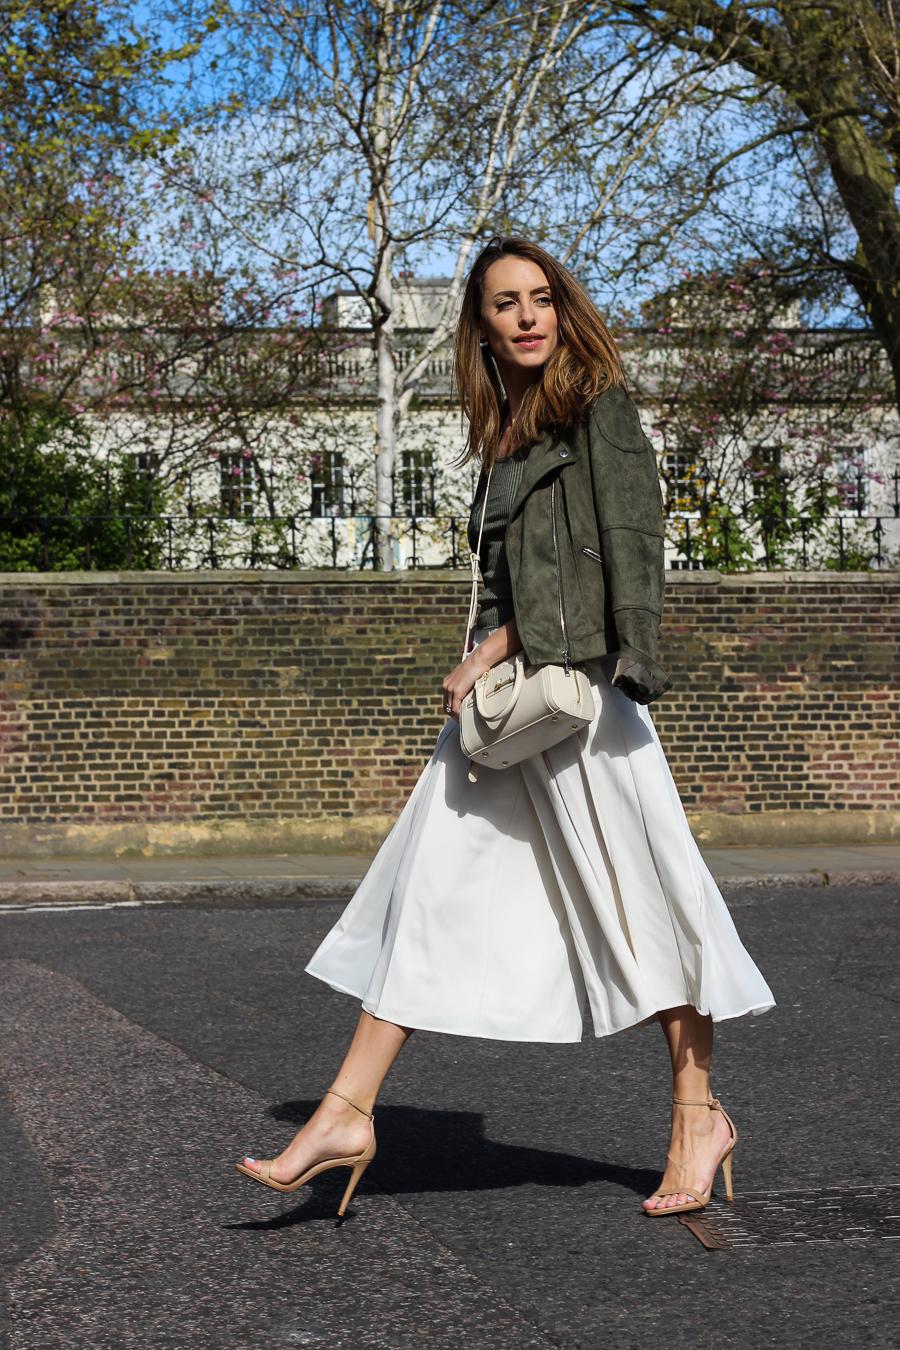 Folli Follie UK - Clutch and carry on - uk travel blogger, uk fashion blogger, london street style, sabrina chakici tblogger-51